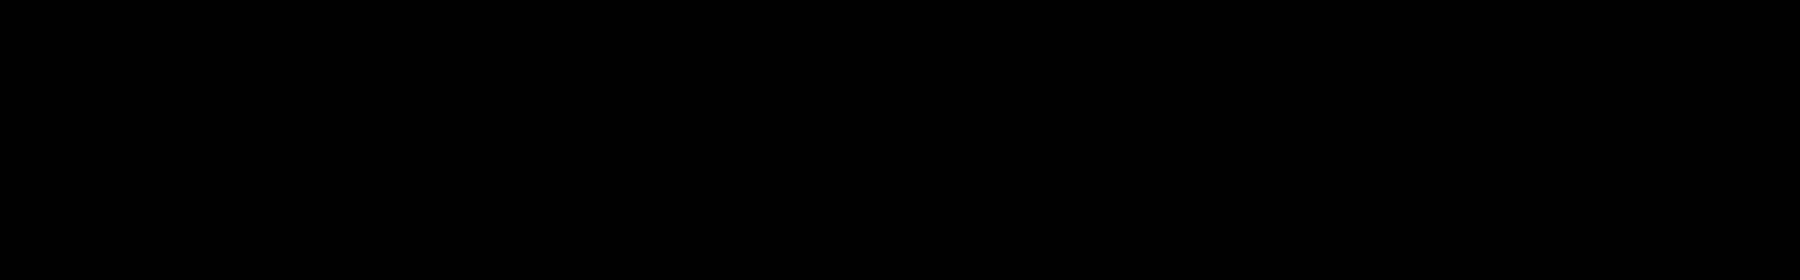 Razor Dubstep Bundle audio waveform